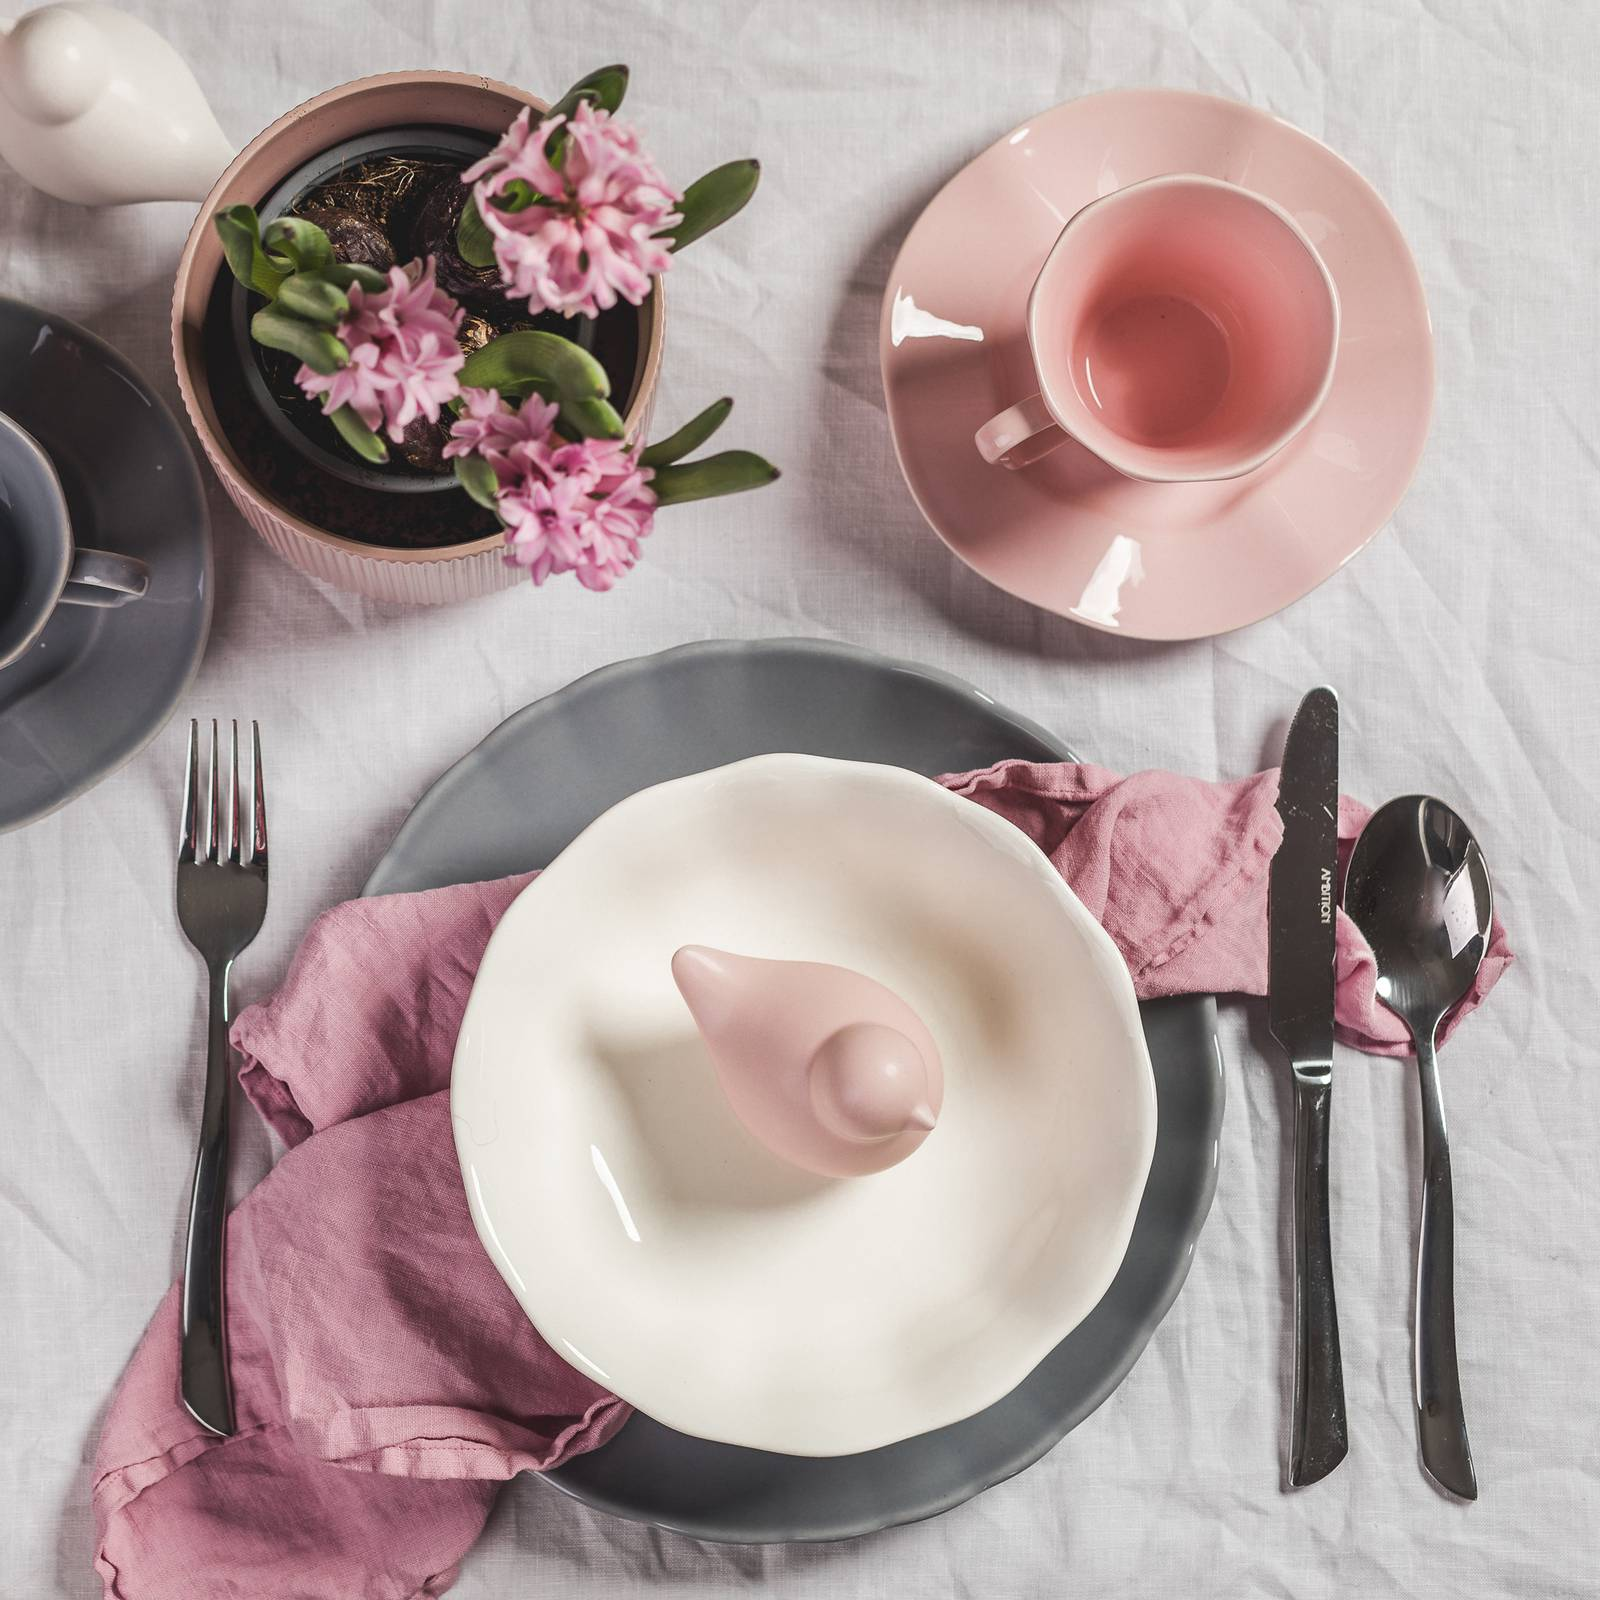 Salaterka / Talerz do zupy Diana Rustic Cream 19 cm AMBITION